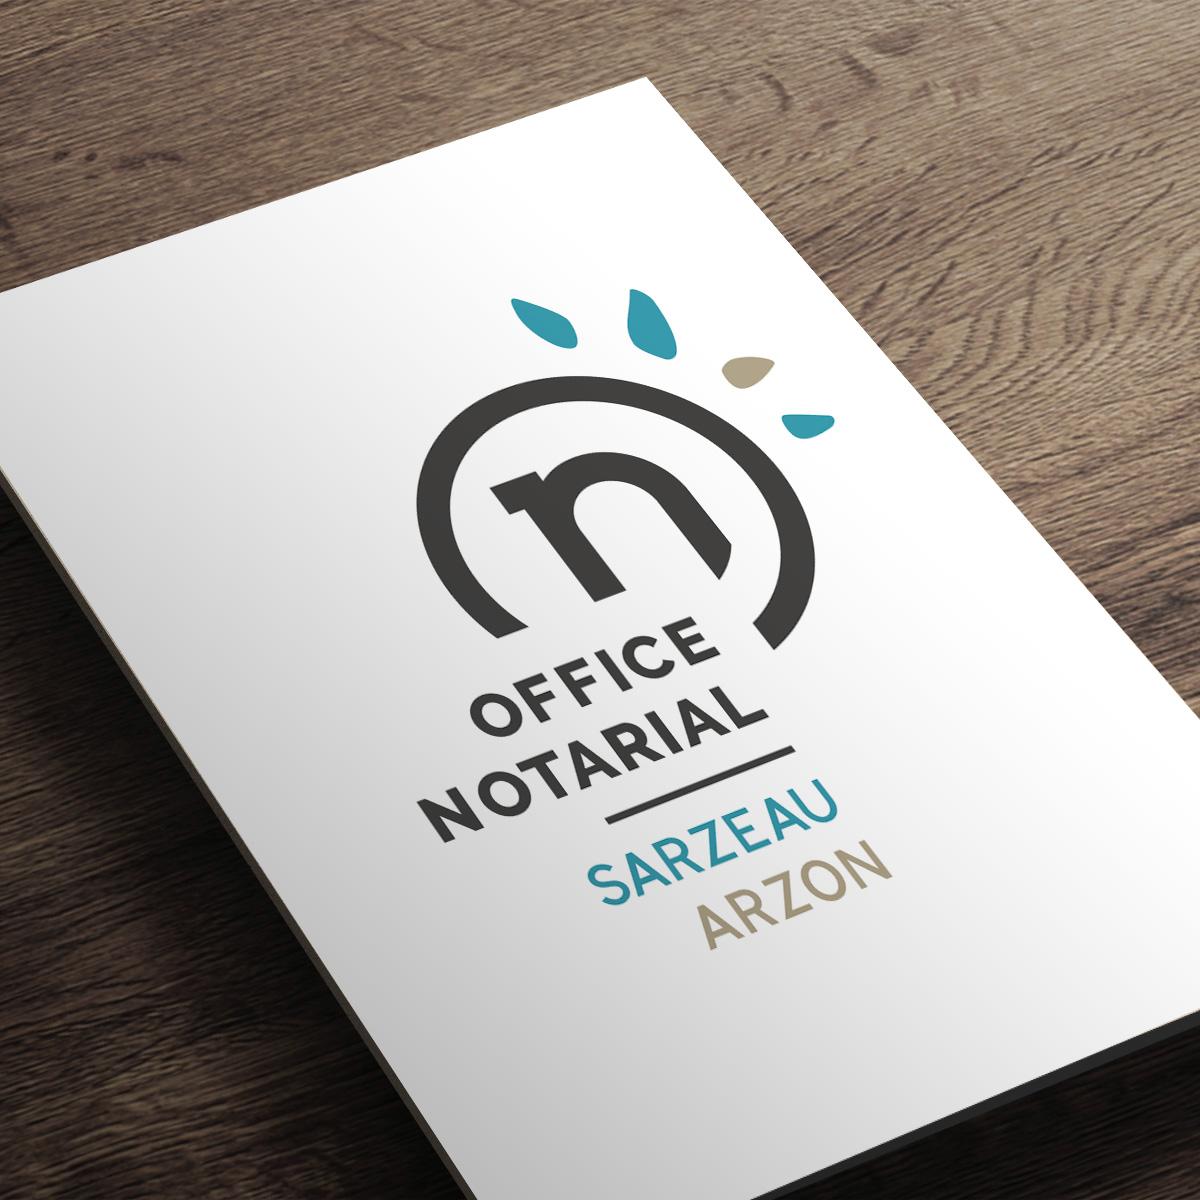 Logo de l'Office notarial